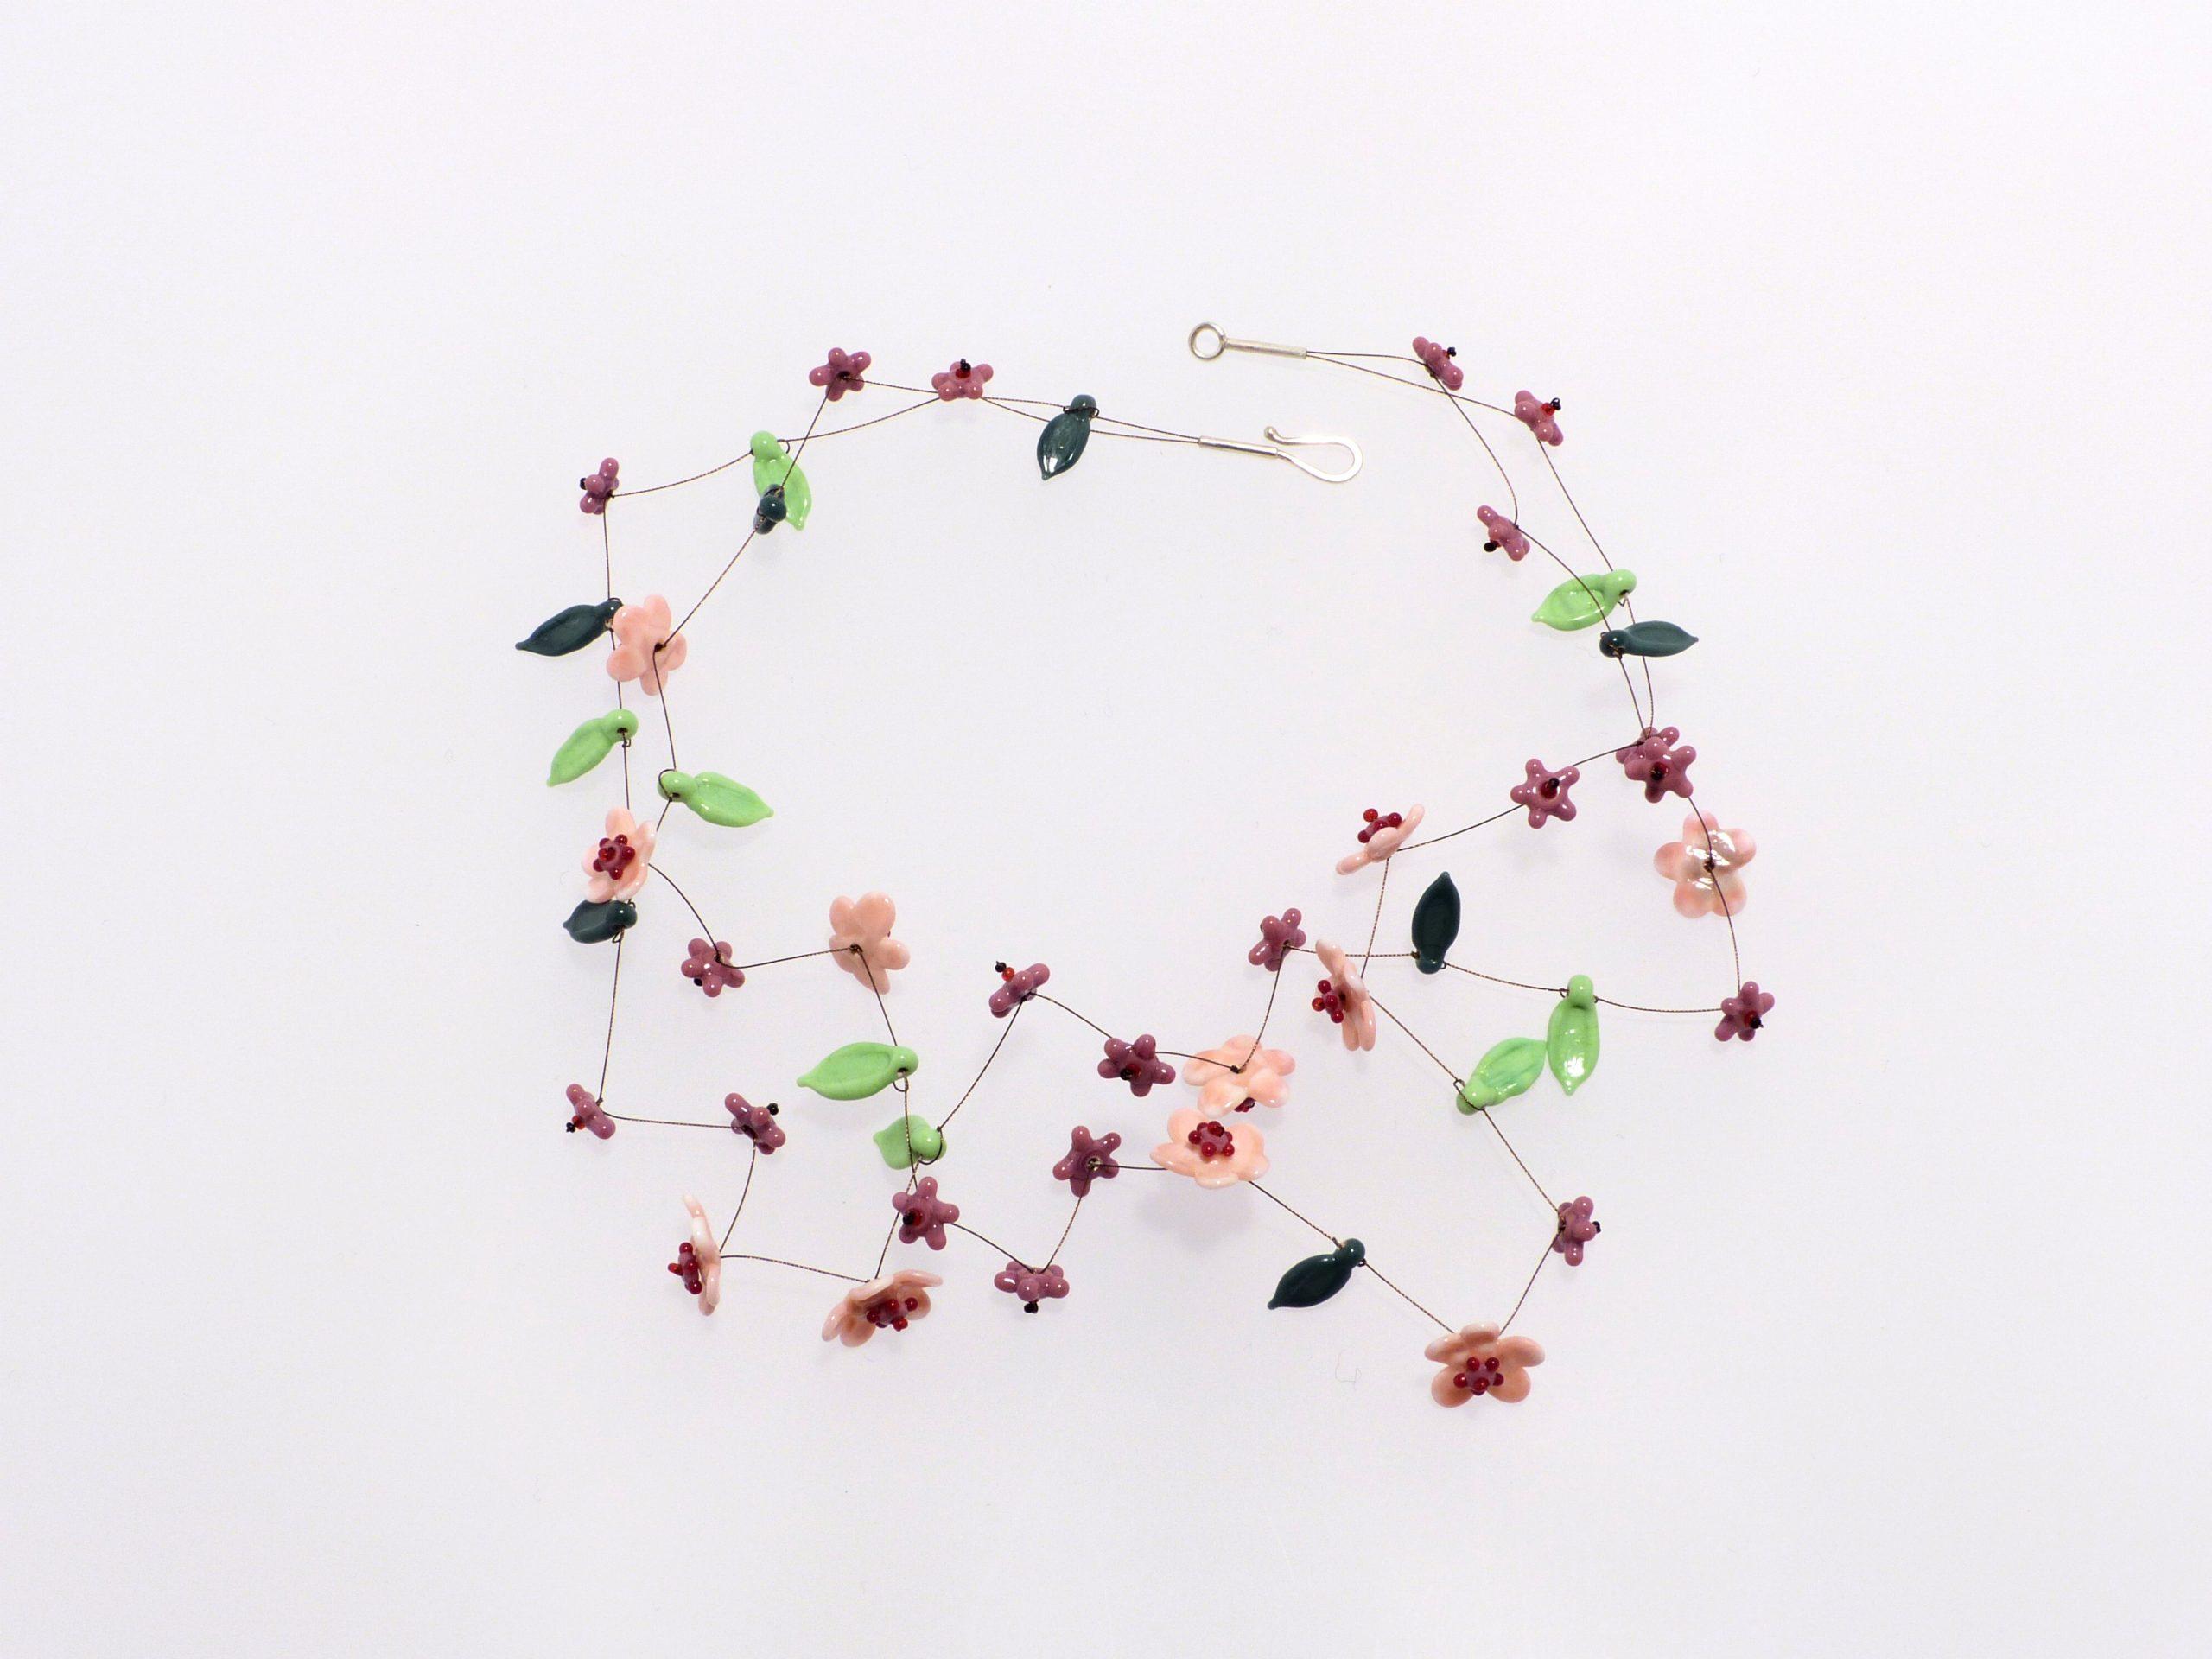 rosa Blüten 2 Str. | Glas, Stahlseil, Silber | 1101014-20